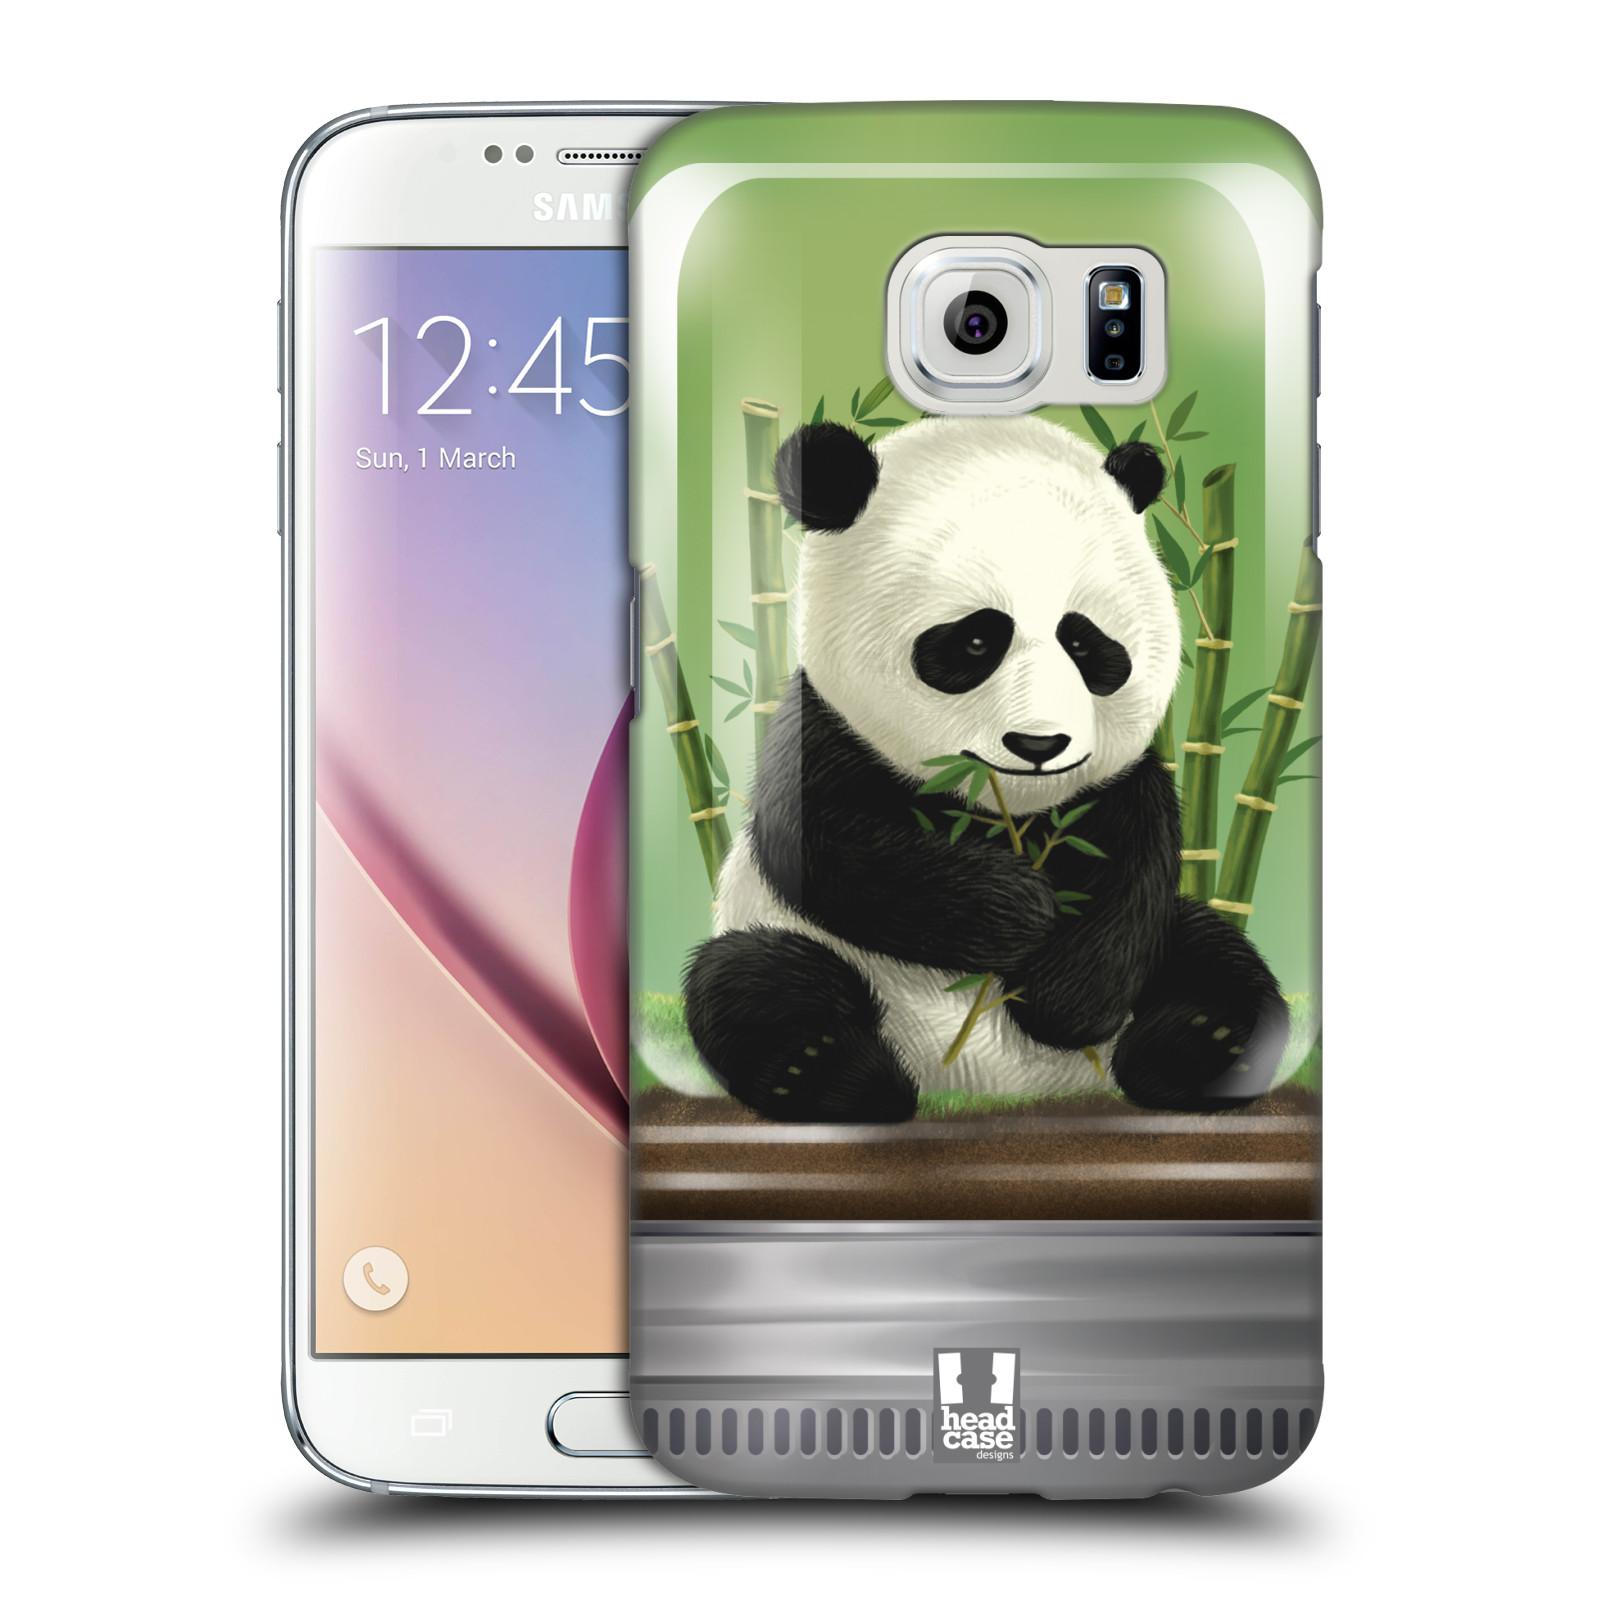 HEAD CASE plastový obal na mobil SAMSUNG Galaxy S6 (G9200, G920F) vzor Zvířátka v těžítku panda